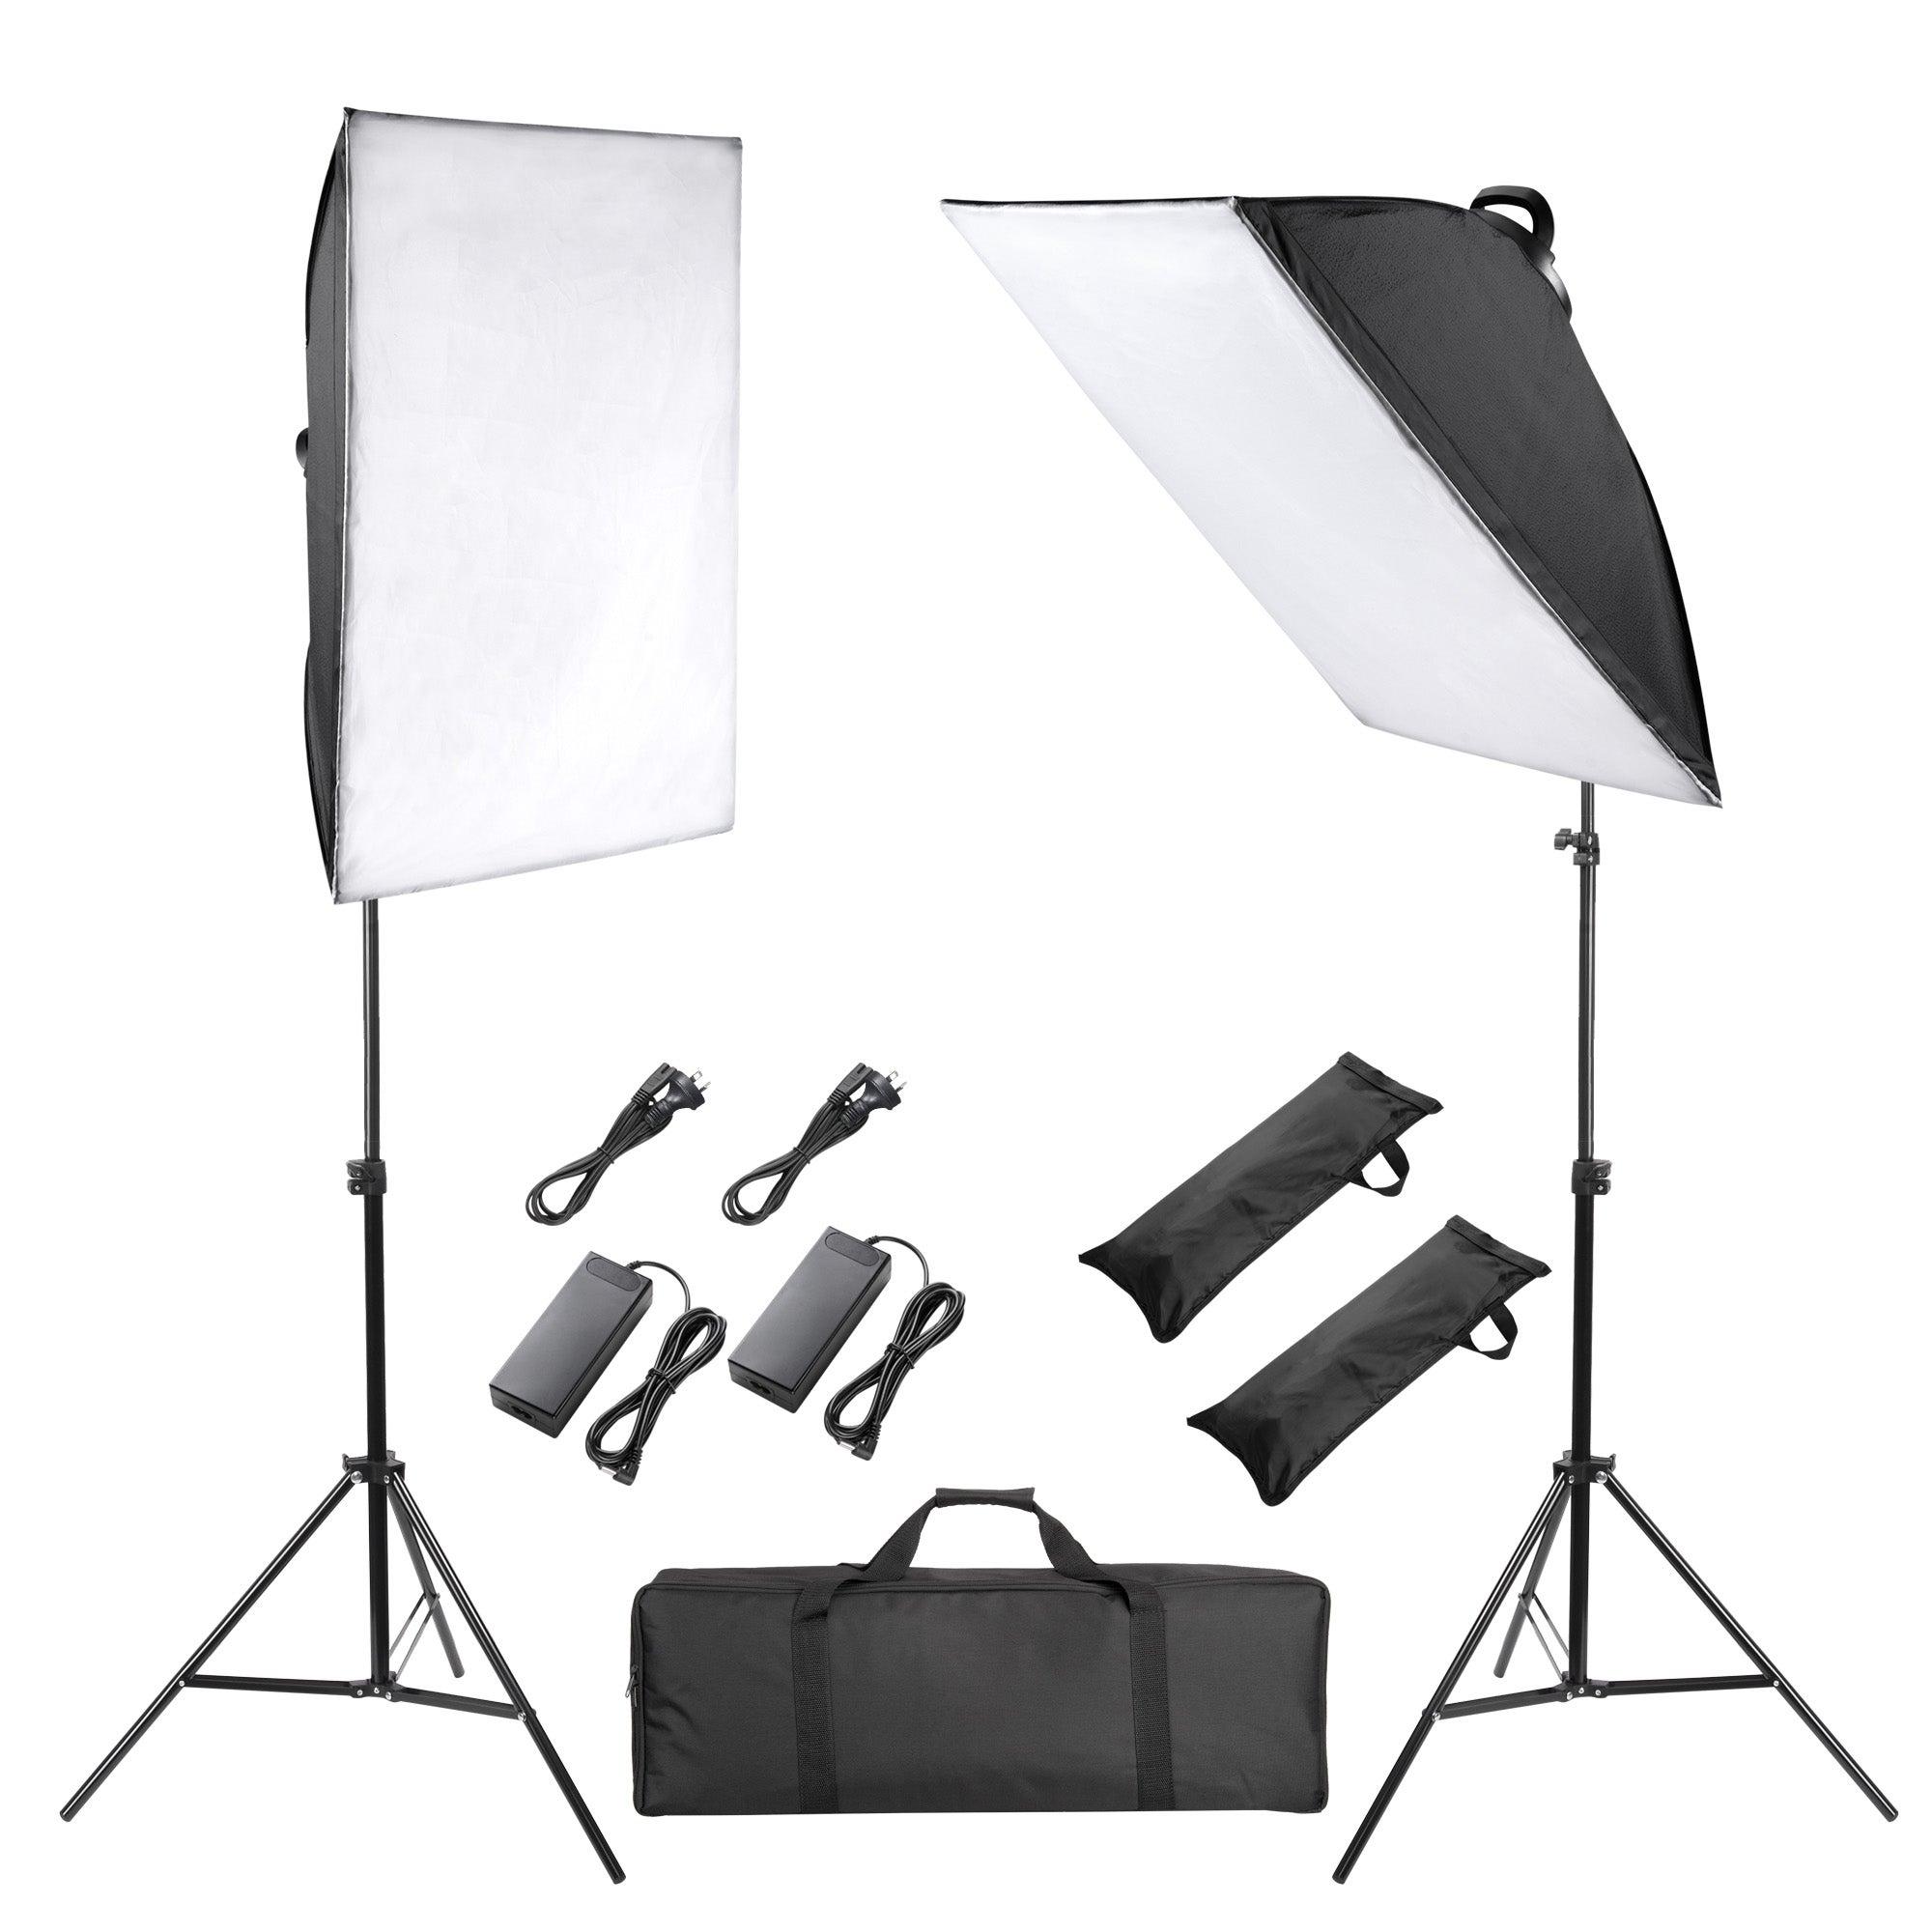 Yescom 2 Pack 126 LEDs Soft Box Dimmable Lighting Kit for Photo Live Studio Shooting